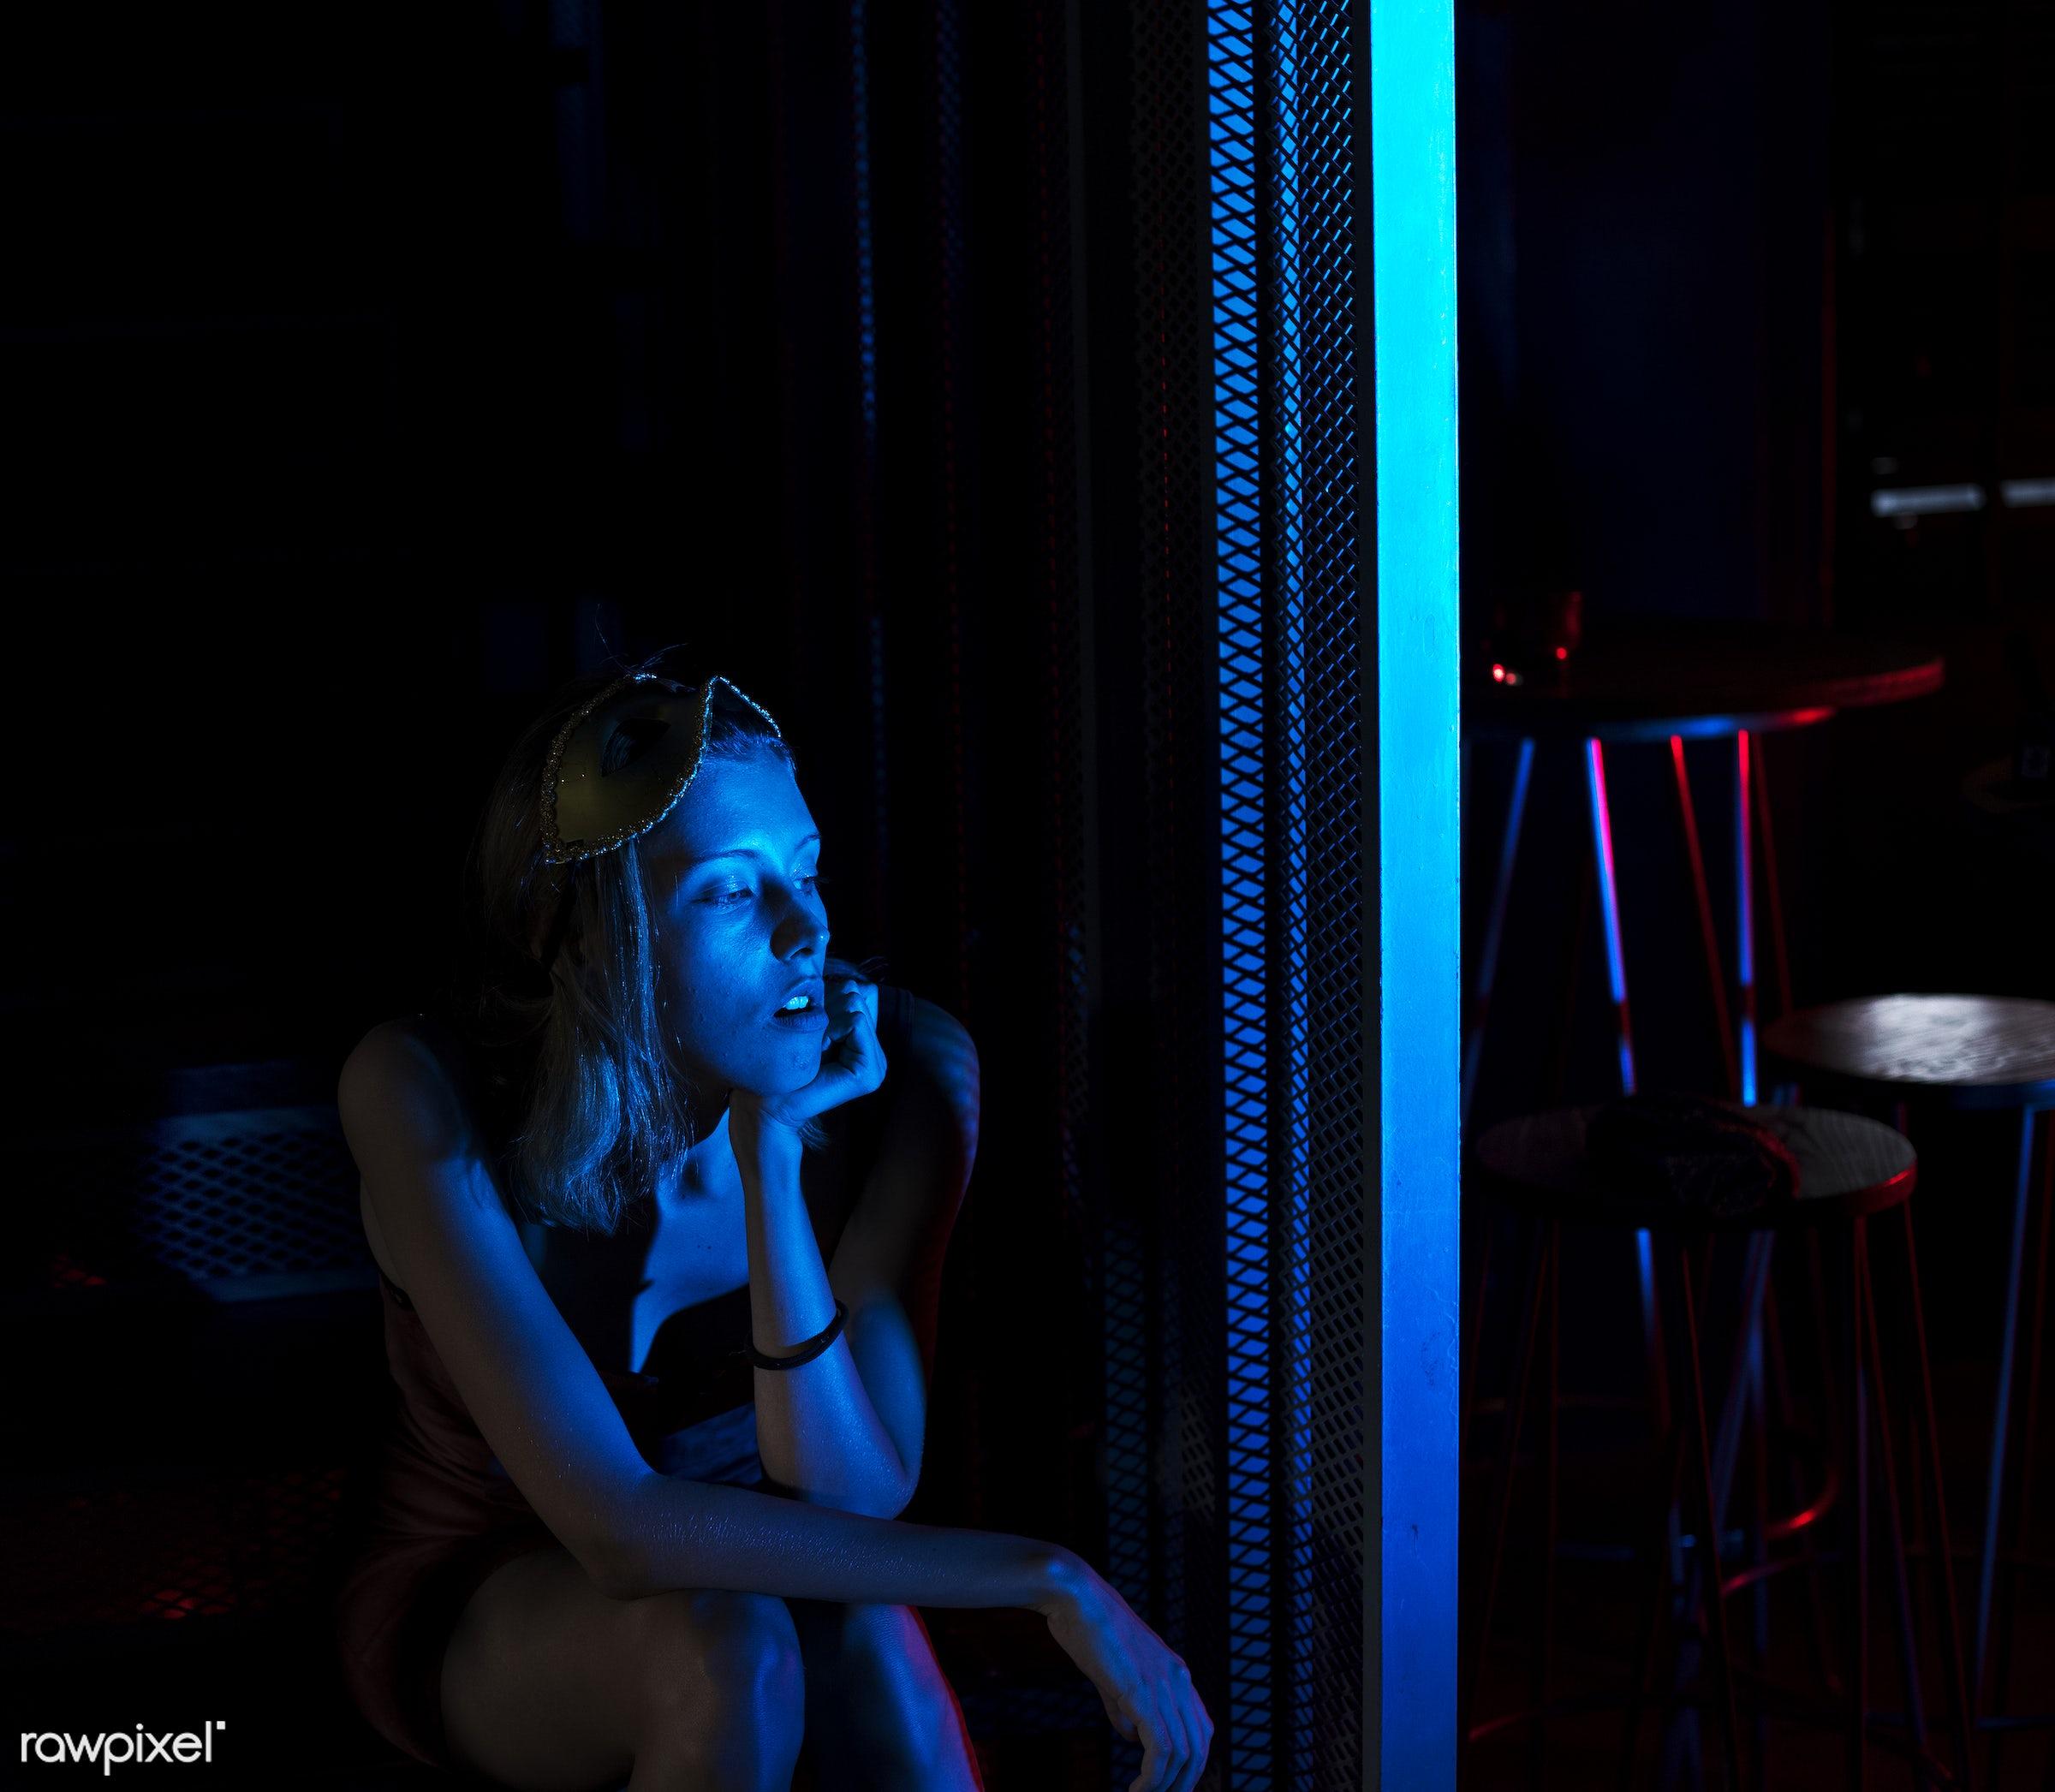 Woman sitting alone in the dark - 2018, alone, caucasian, club, dark, emotion, expression, face, feeling, glam, new years...